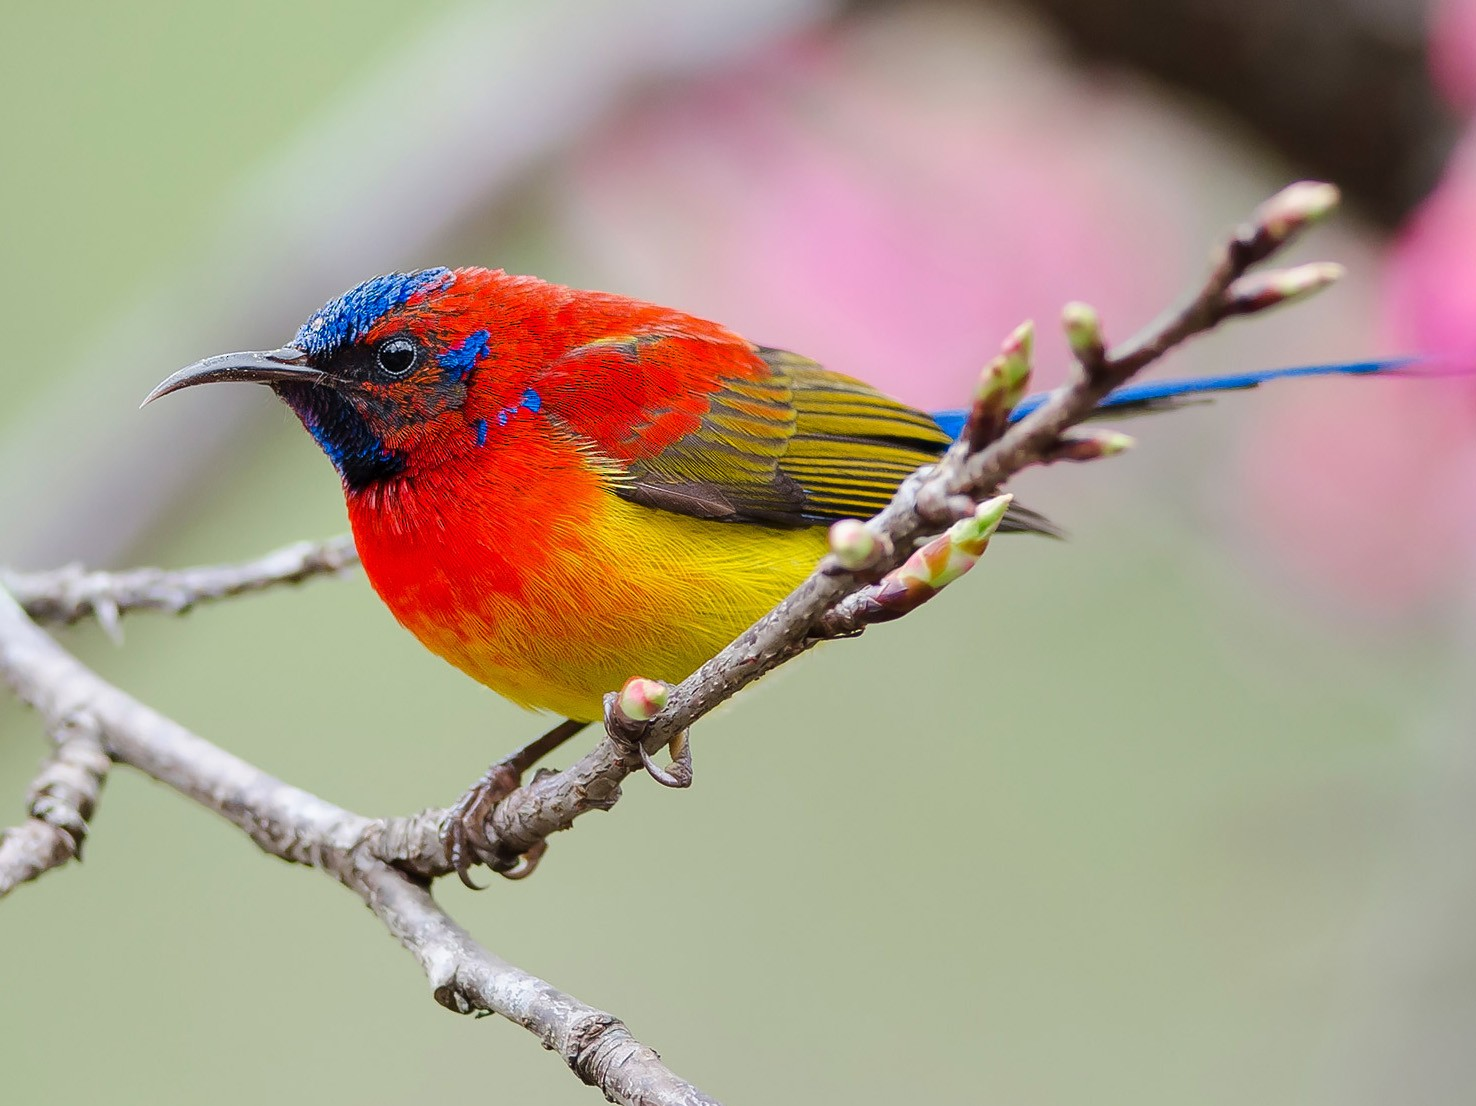 Mrs. Gould's Sunbird - Natthaphat Chotjuckdikul